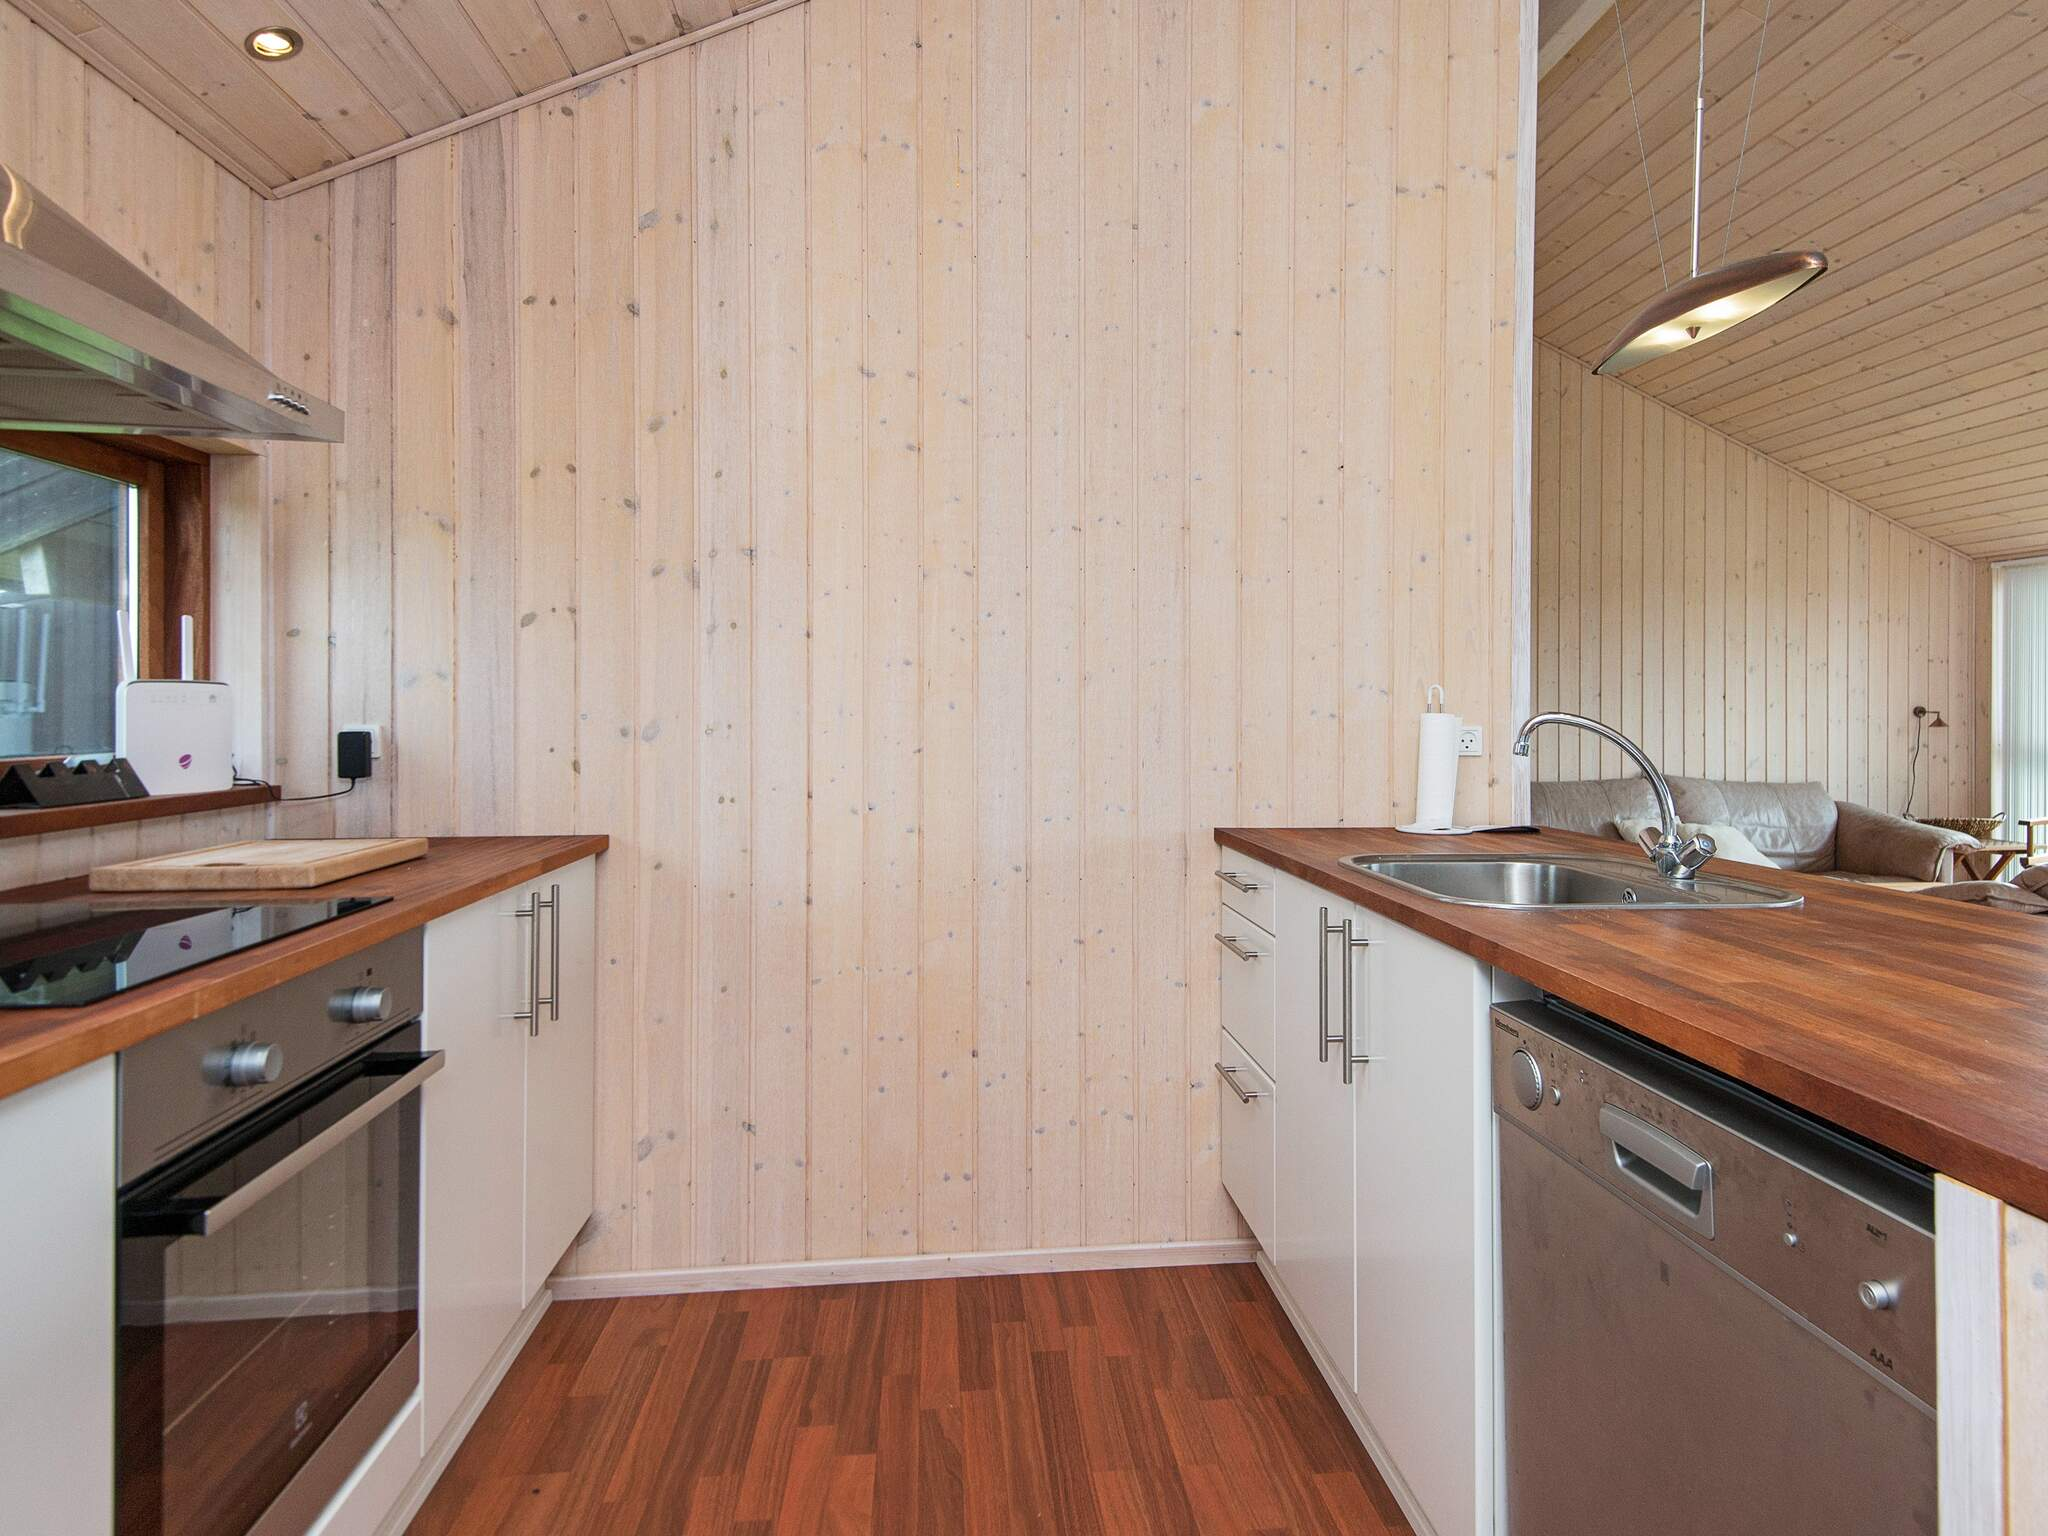 Ferienhaus Skaven Strand (2007964), Tarm, , Westjütland, Dänemark, Bild 6